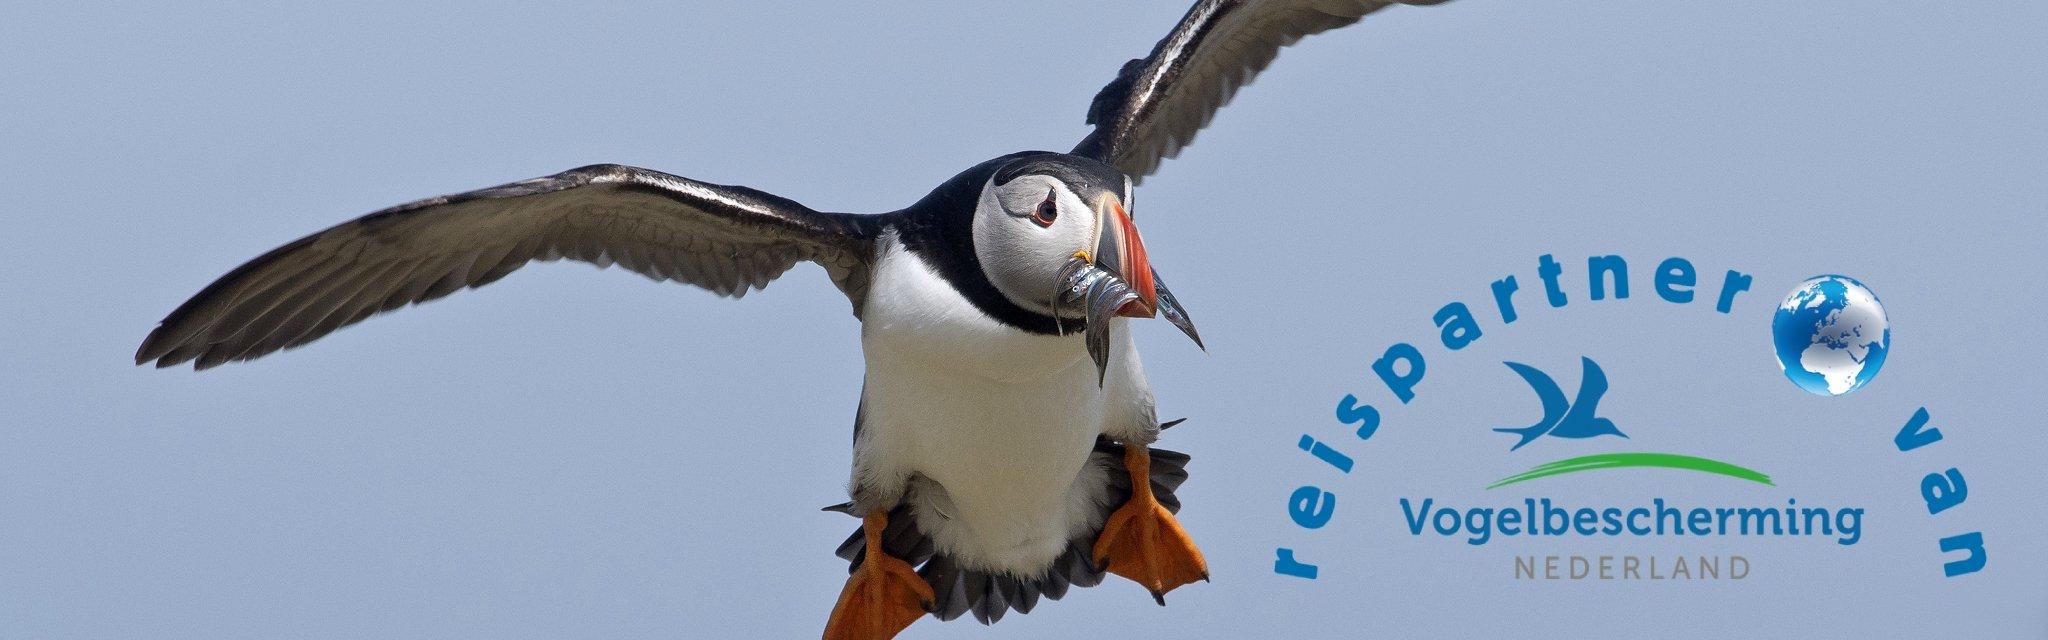 Papegaaiduiker - Jan Bosch - Vogelbescherming